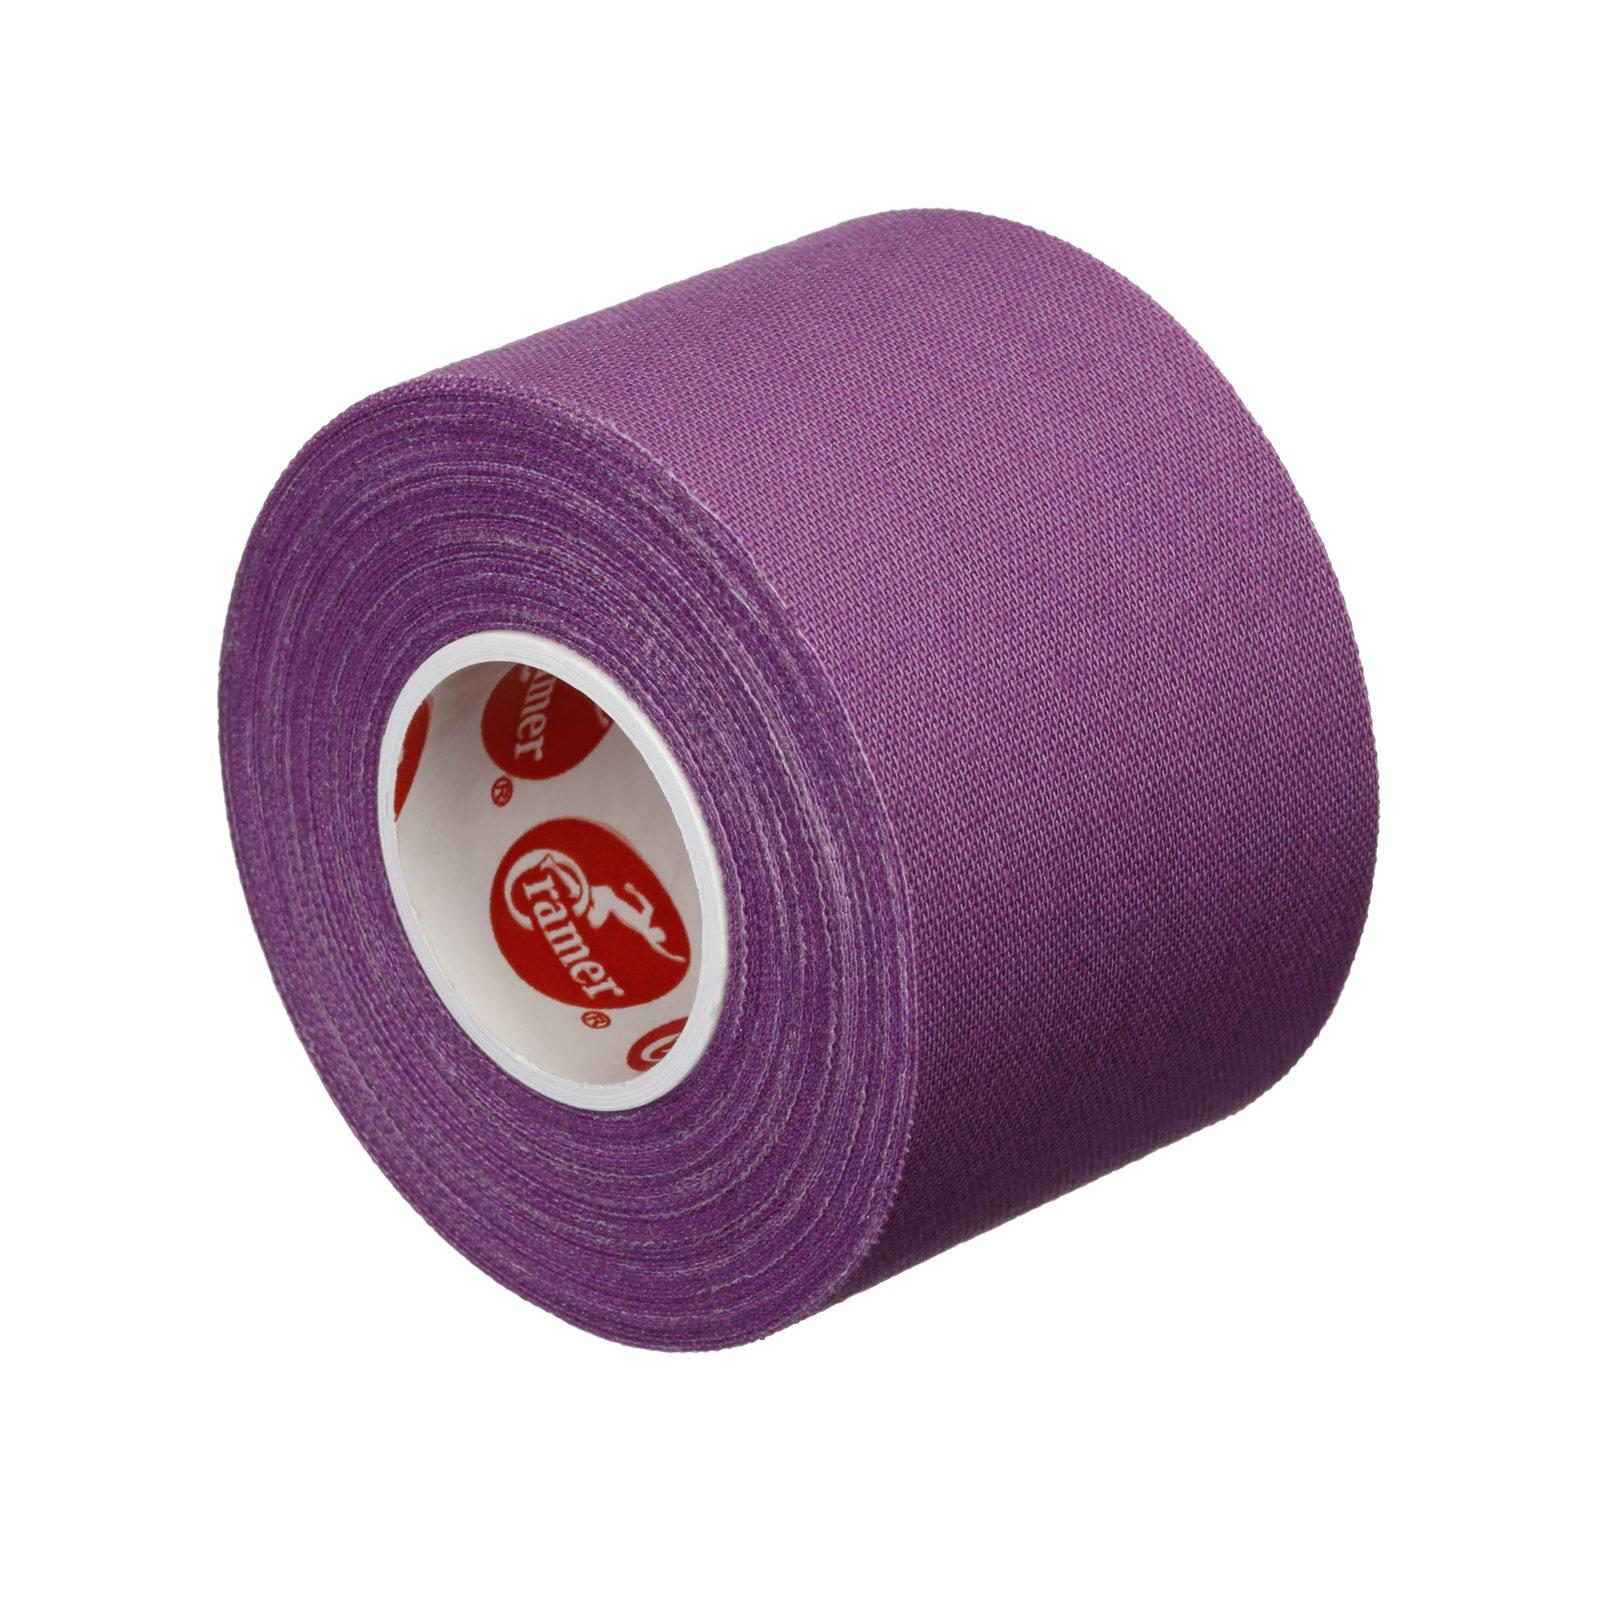 Cramer Athletic Tape, Purple, 1 1/2'' X 10 yd